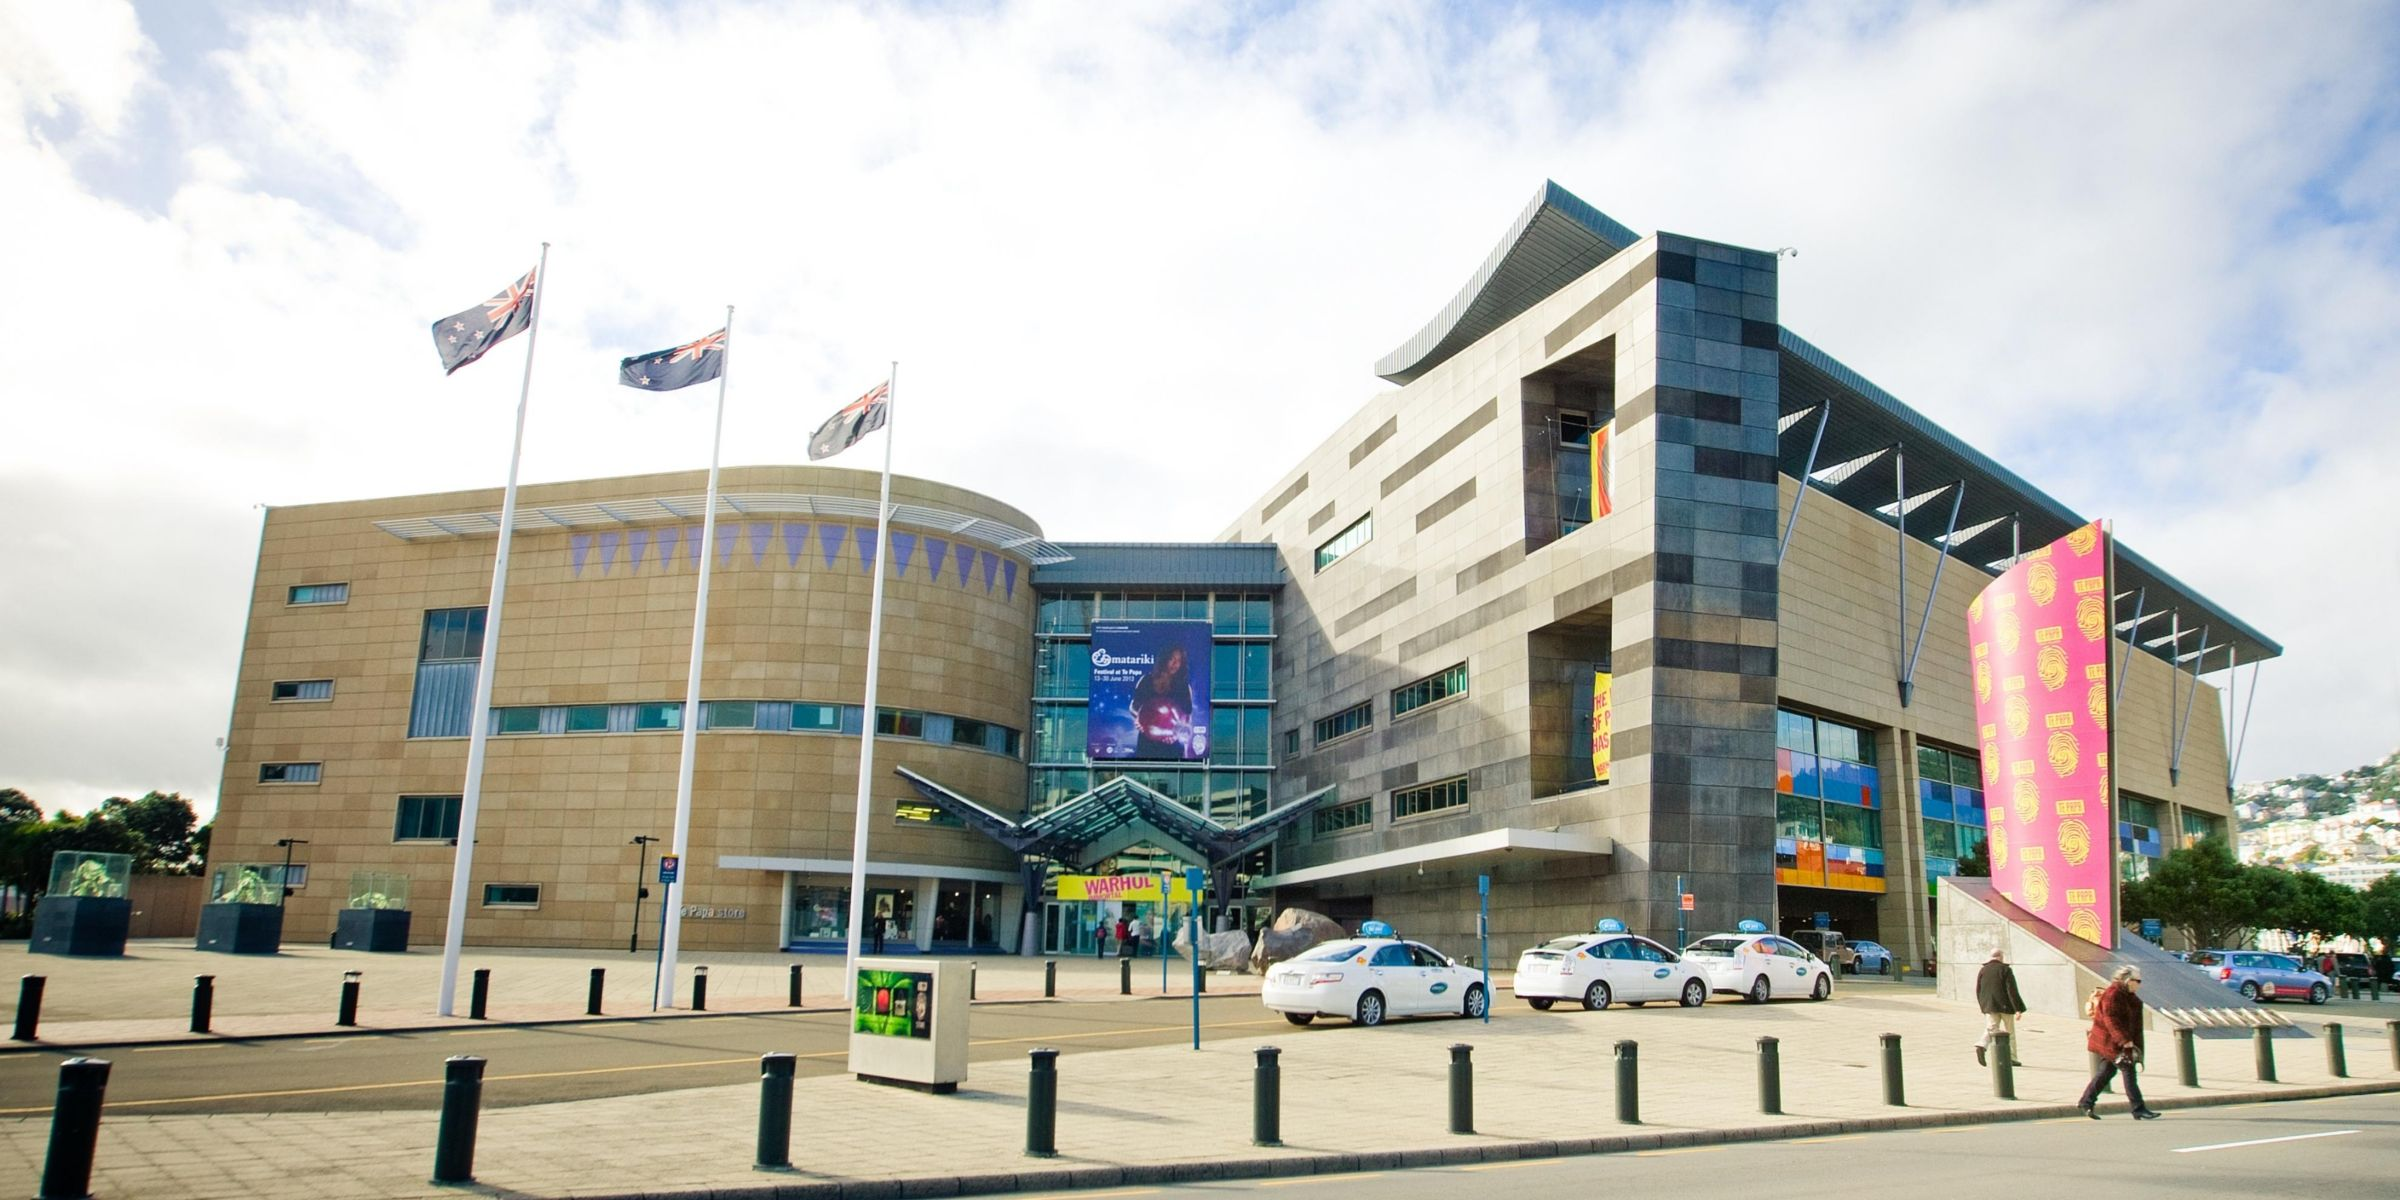 Wellington Hotels Intercontinental Hotel In New Zealand